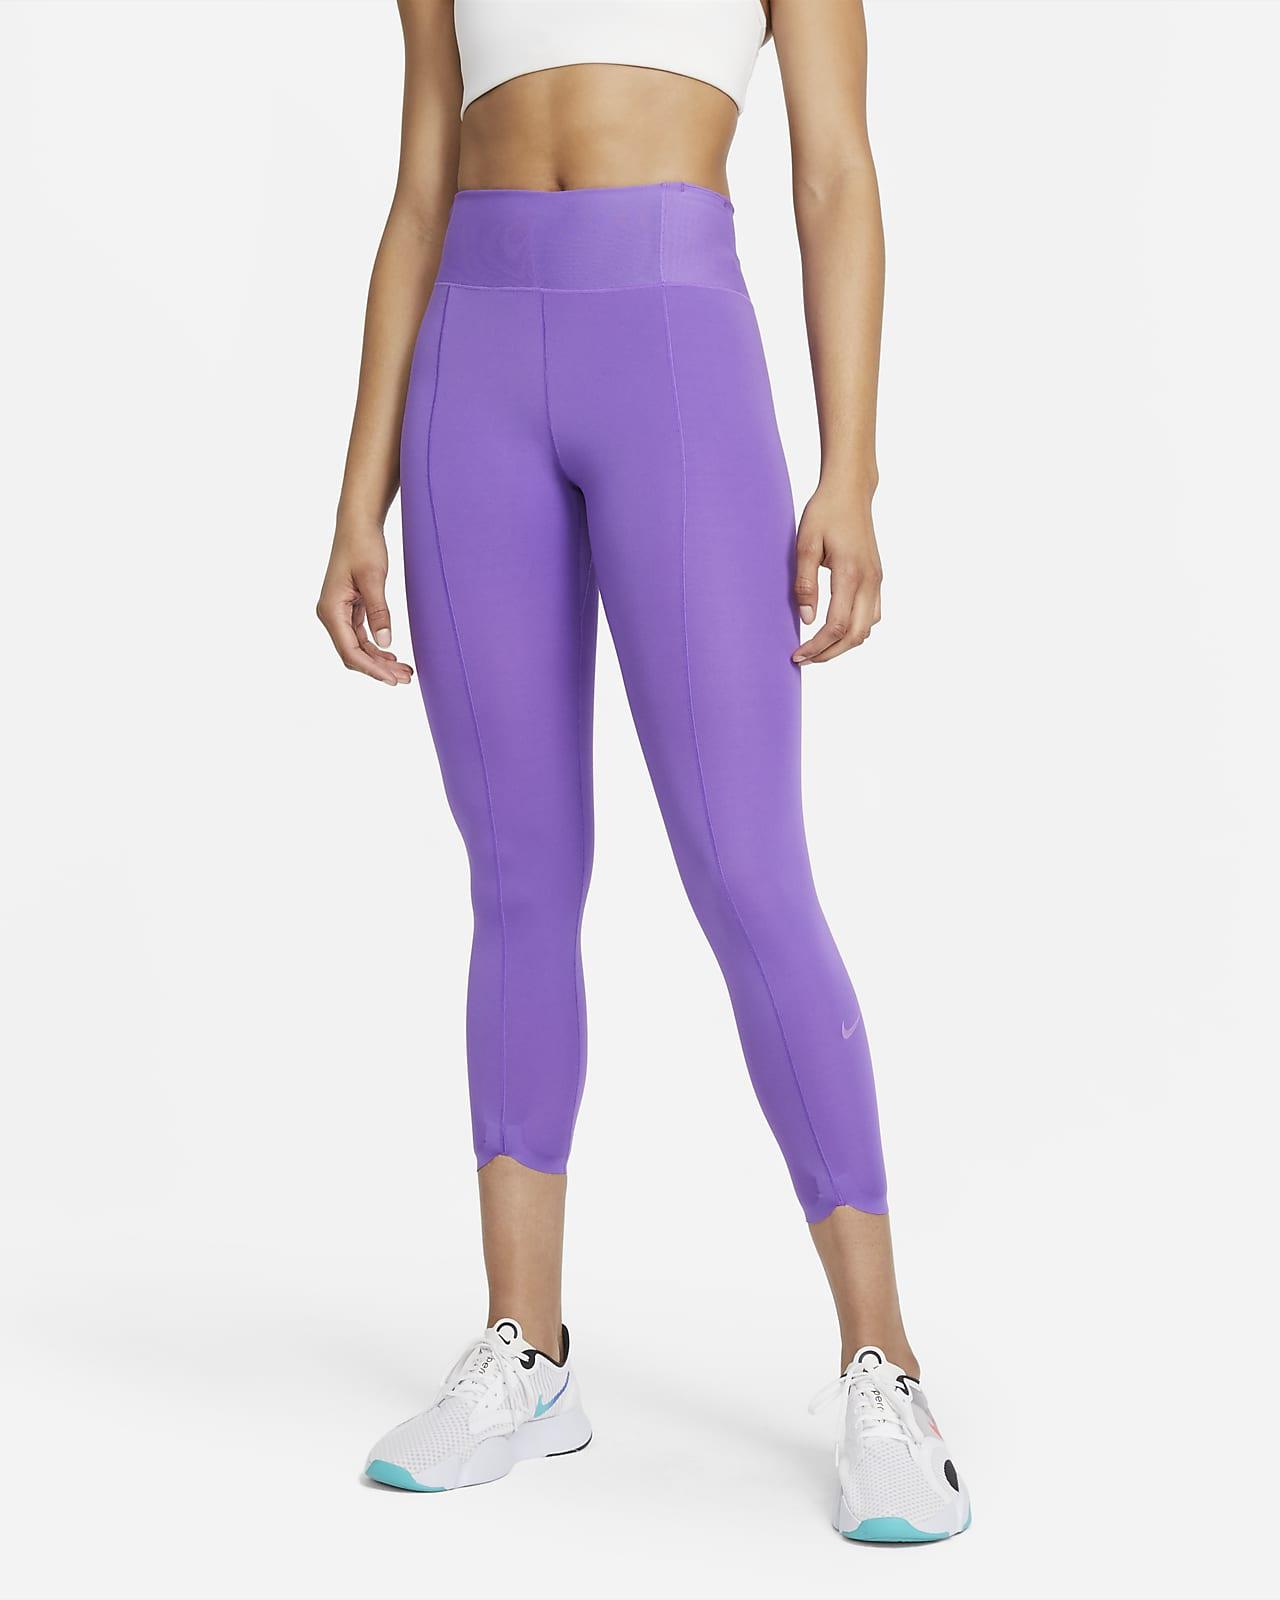 Женские укороченные леггинсы Nike One Luxe Icon Clash